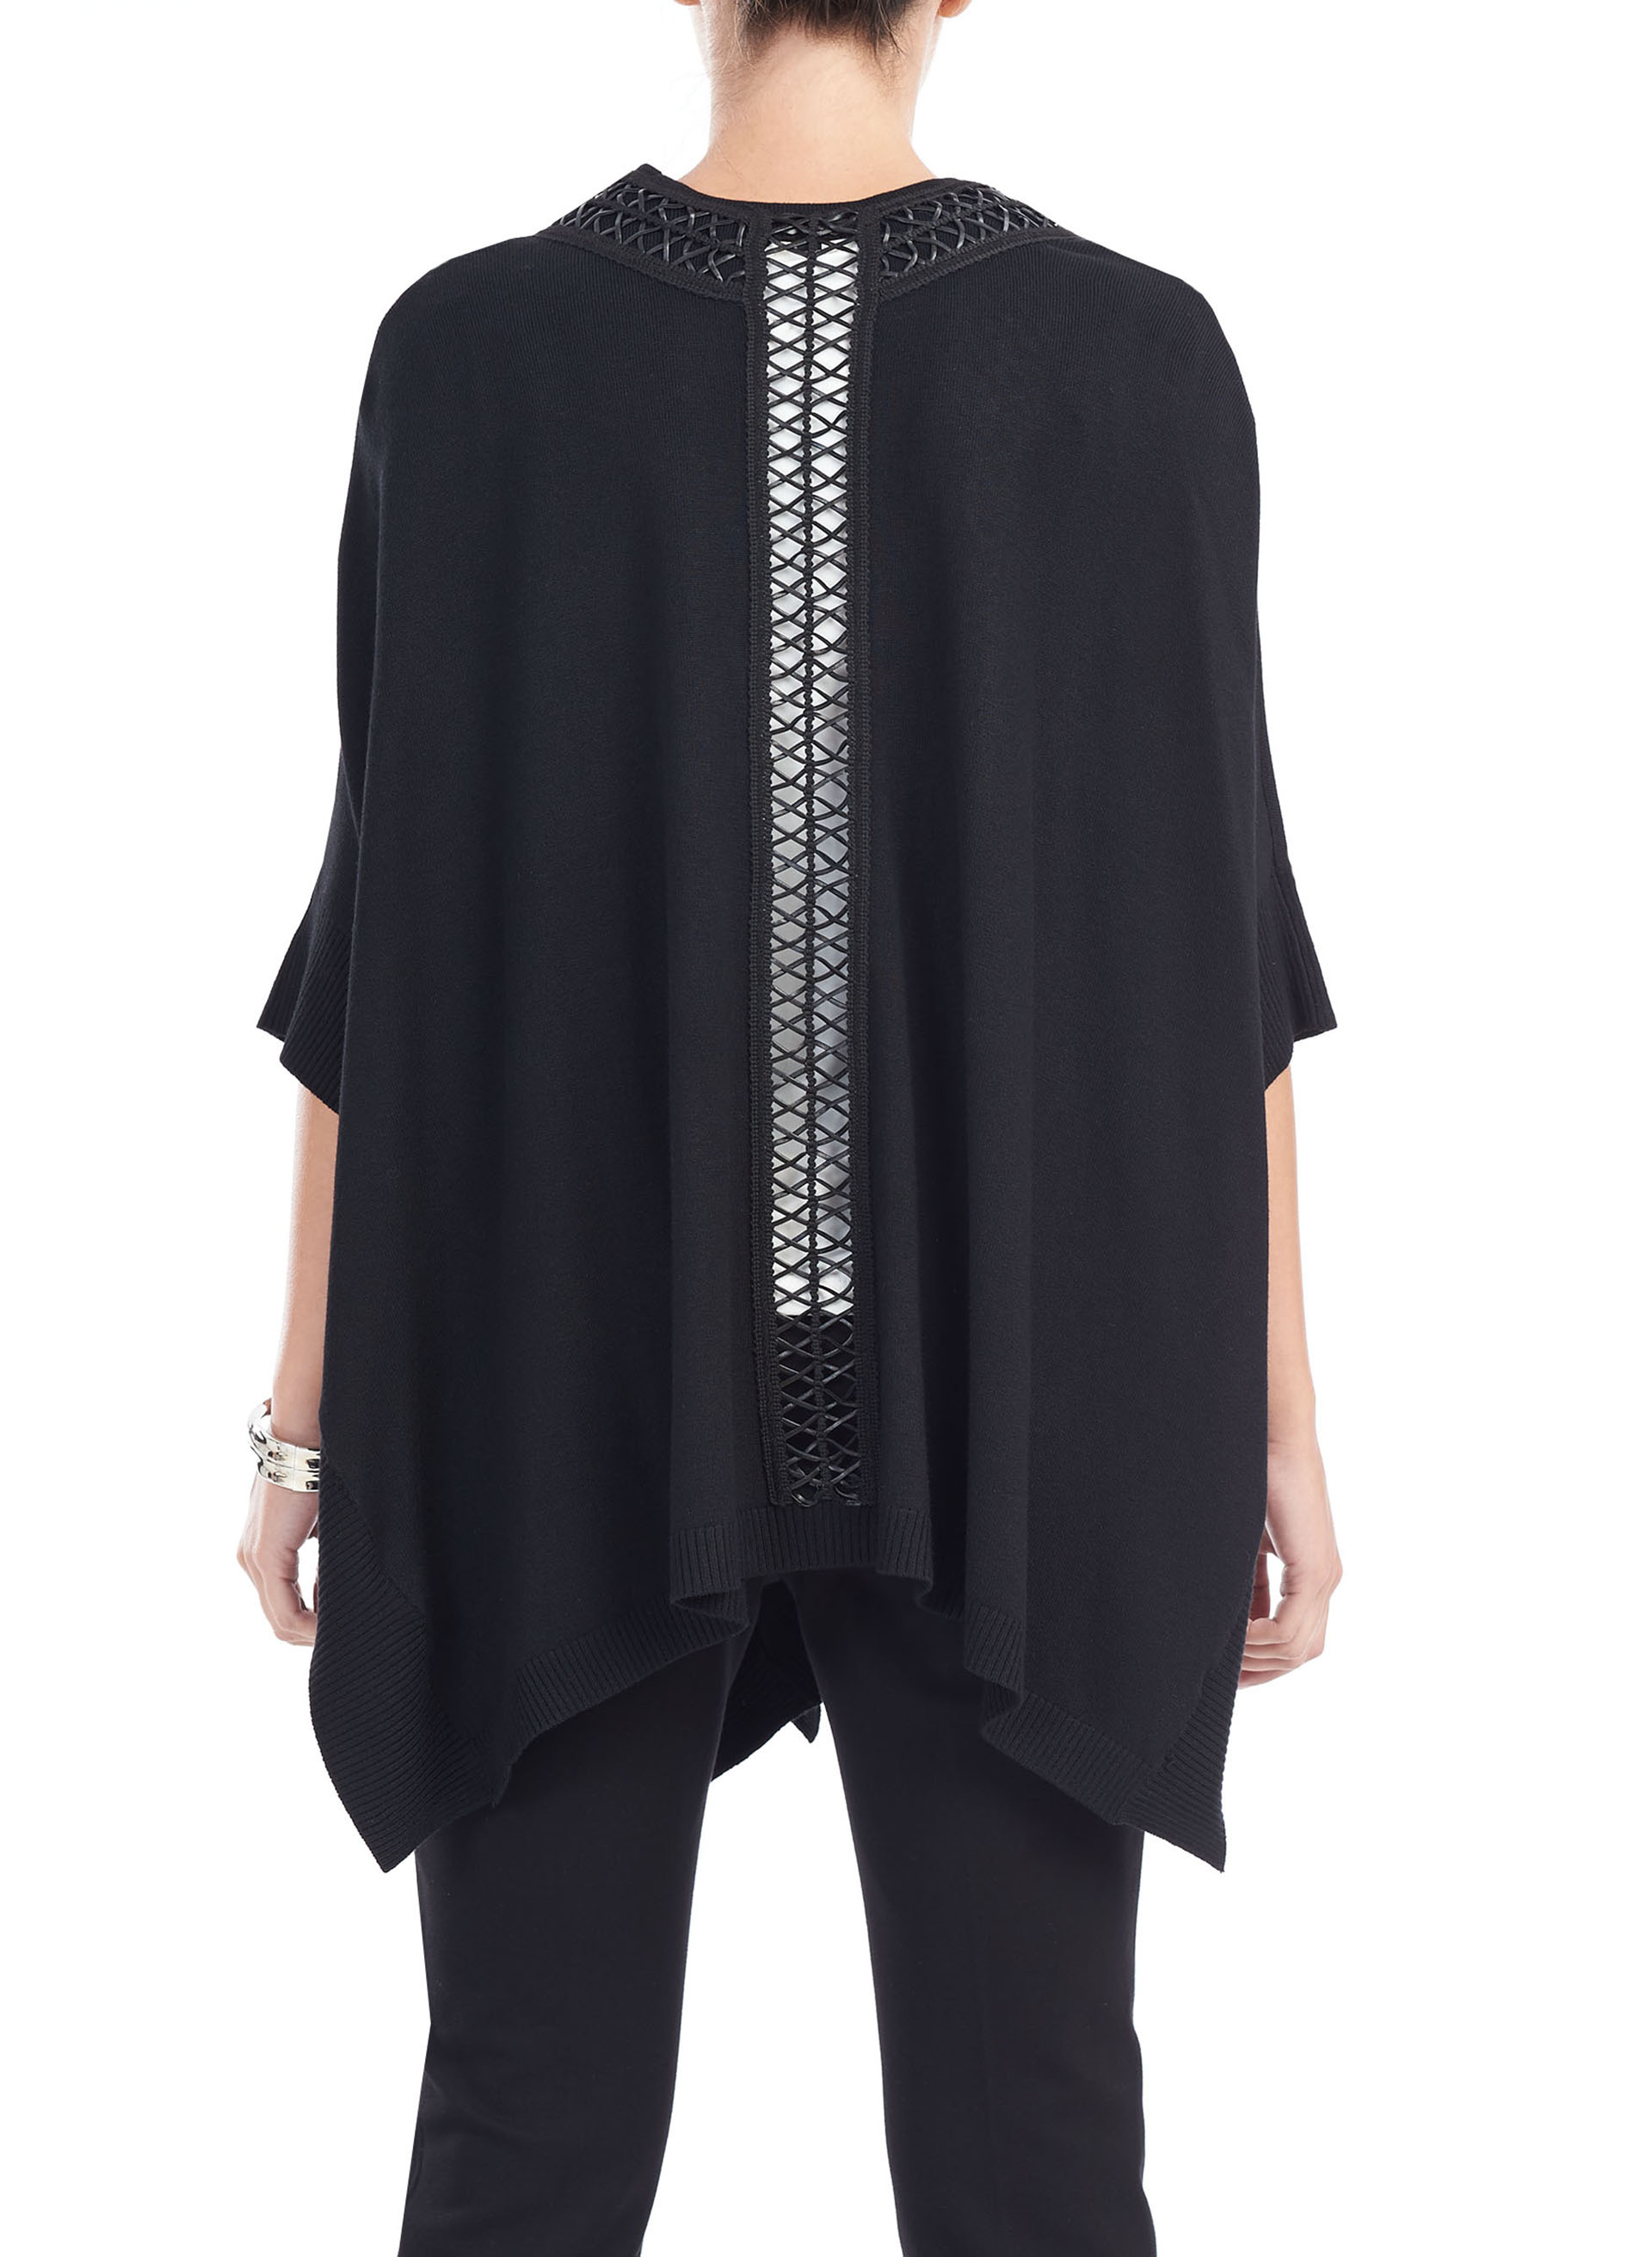 Knitting Pattern Kimono Cardigan : Kimono Sleeve Knit Cardigan FREE Shipping* Melanie Lyne